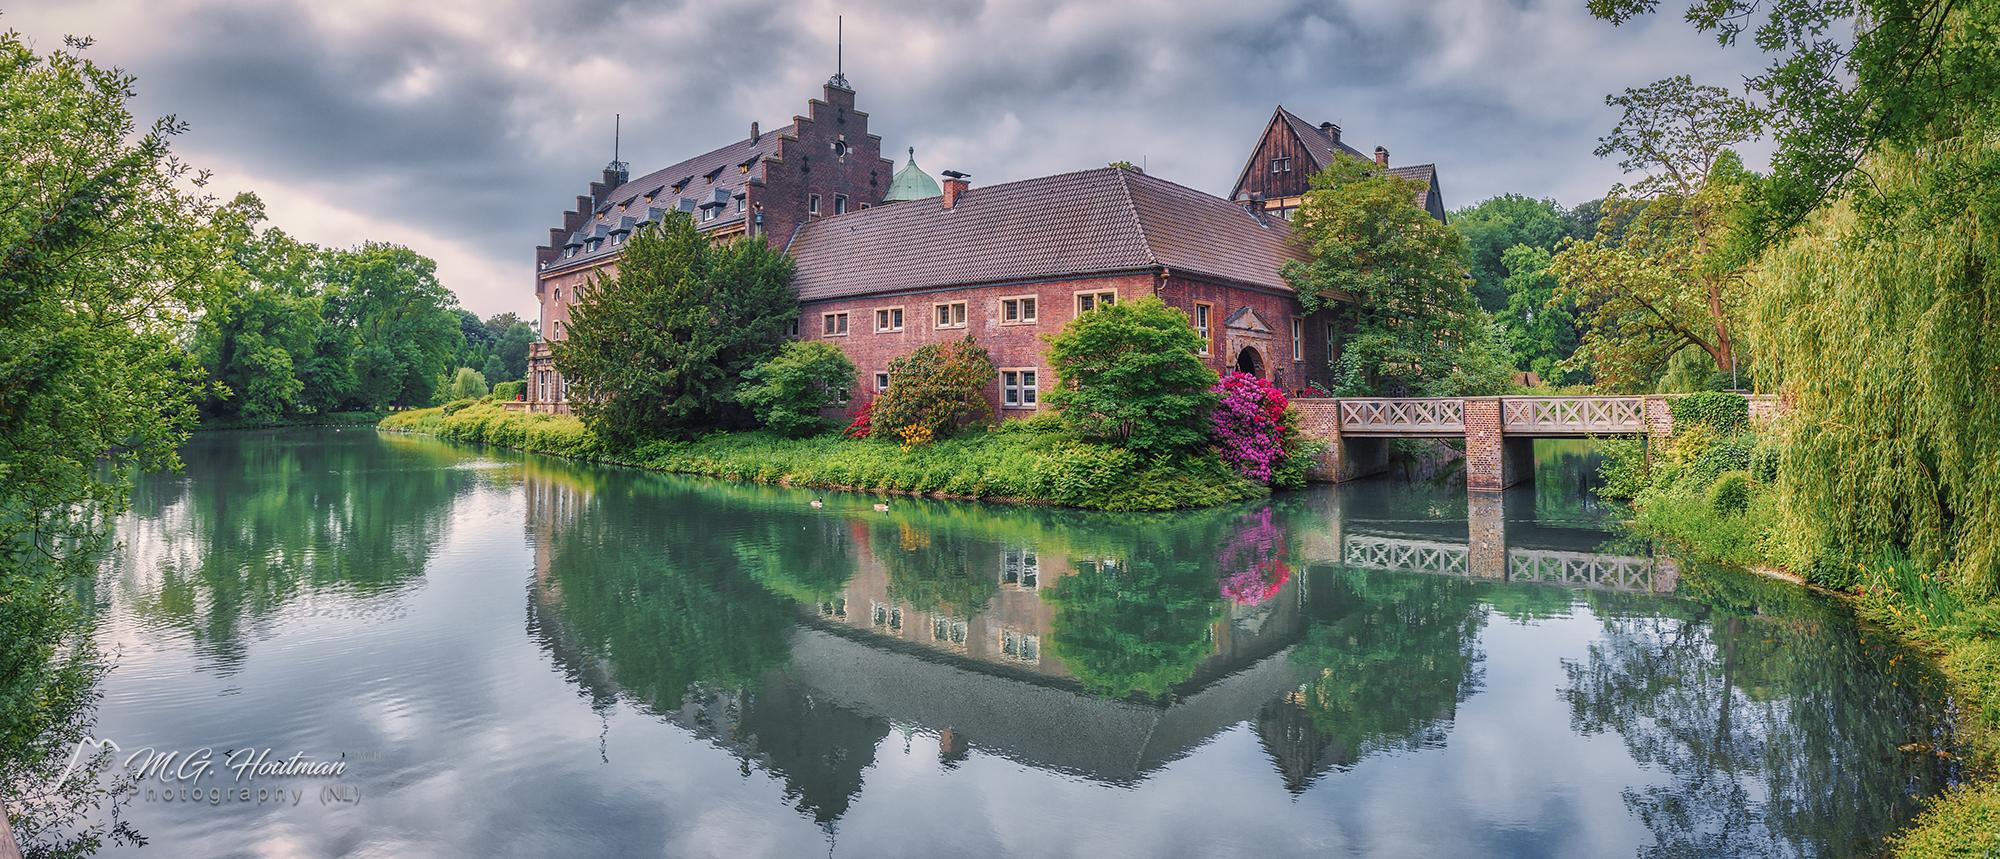 Schloss Wittringen